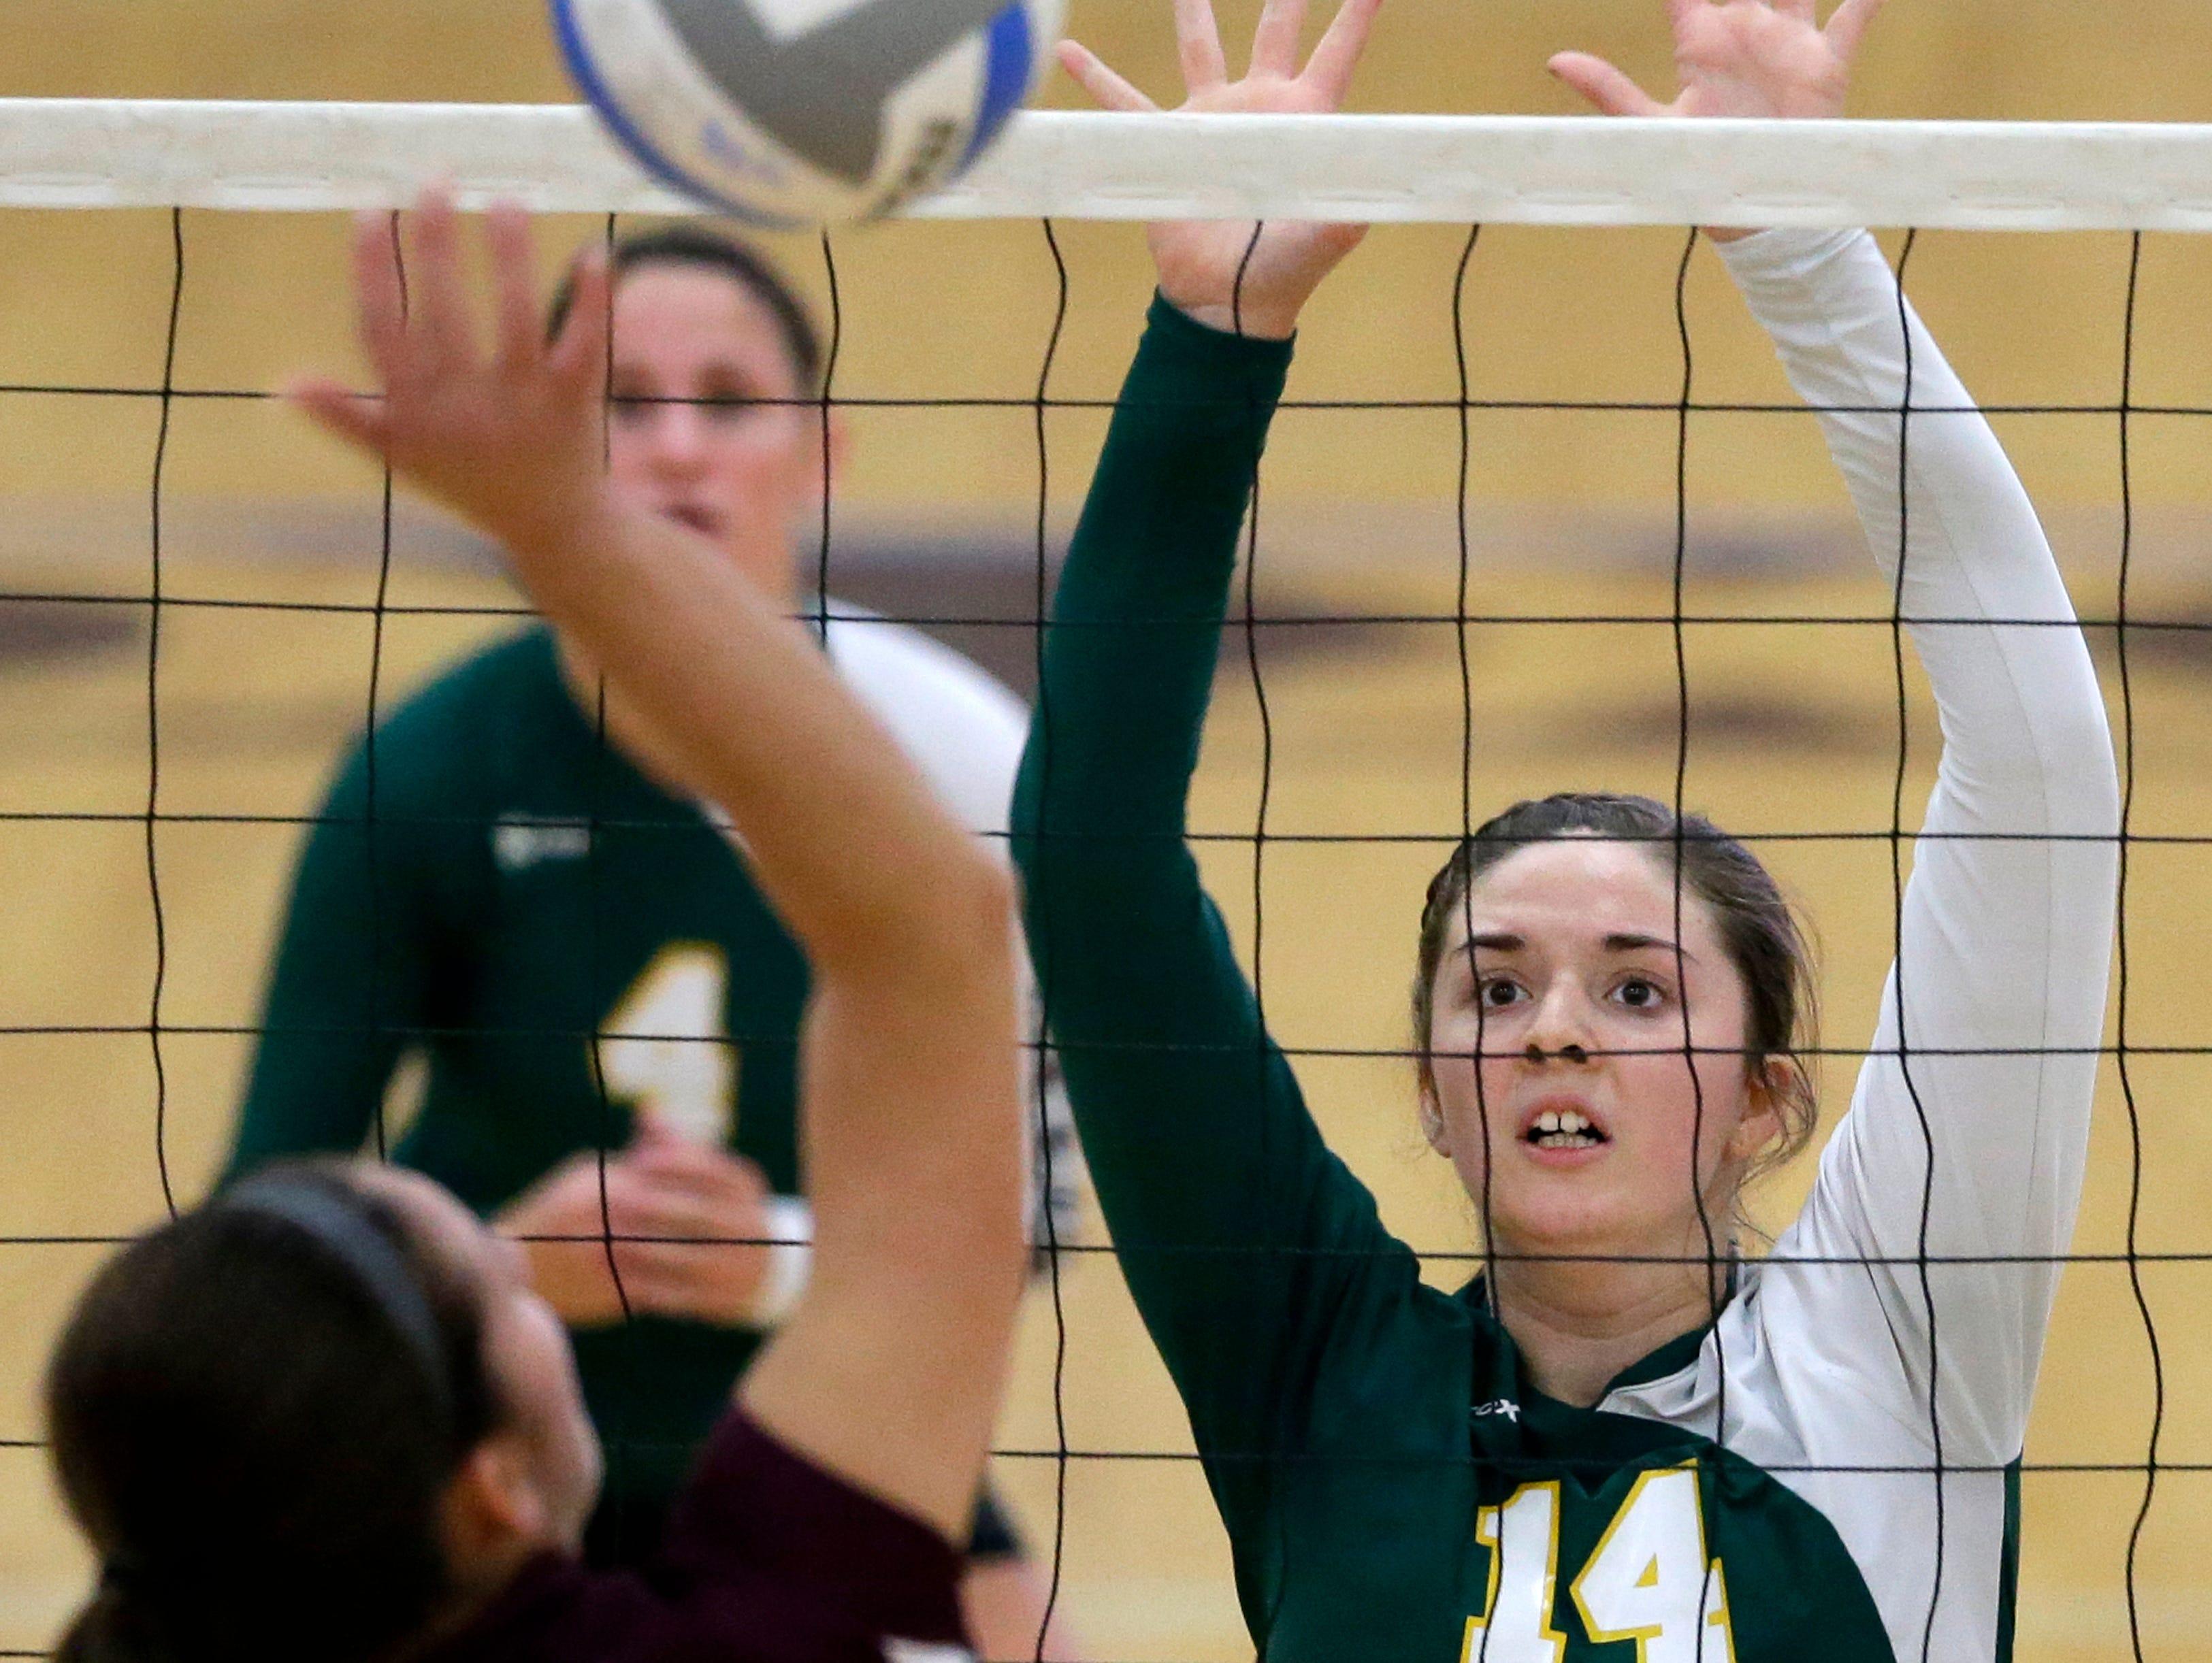 Fox Valley Lutheran High School's Amber Schroeder looks to get a hit past Freedom High School's Mercedes Heenes Tuesday, Oct. 20, 2015, in Appleton, Wis.